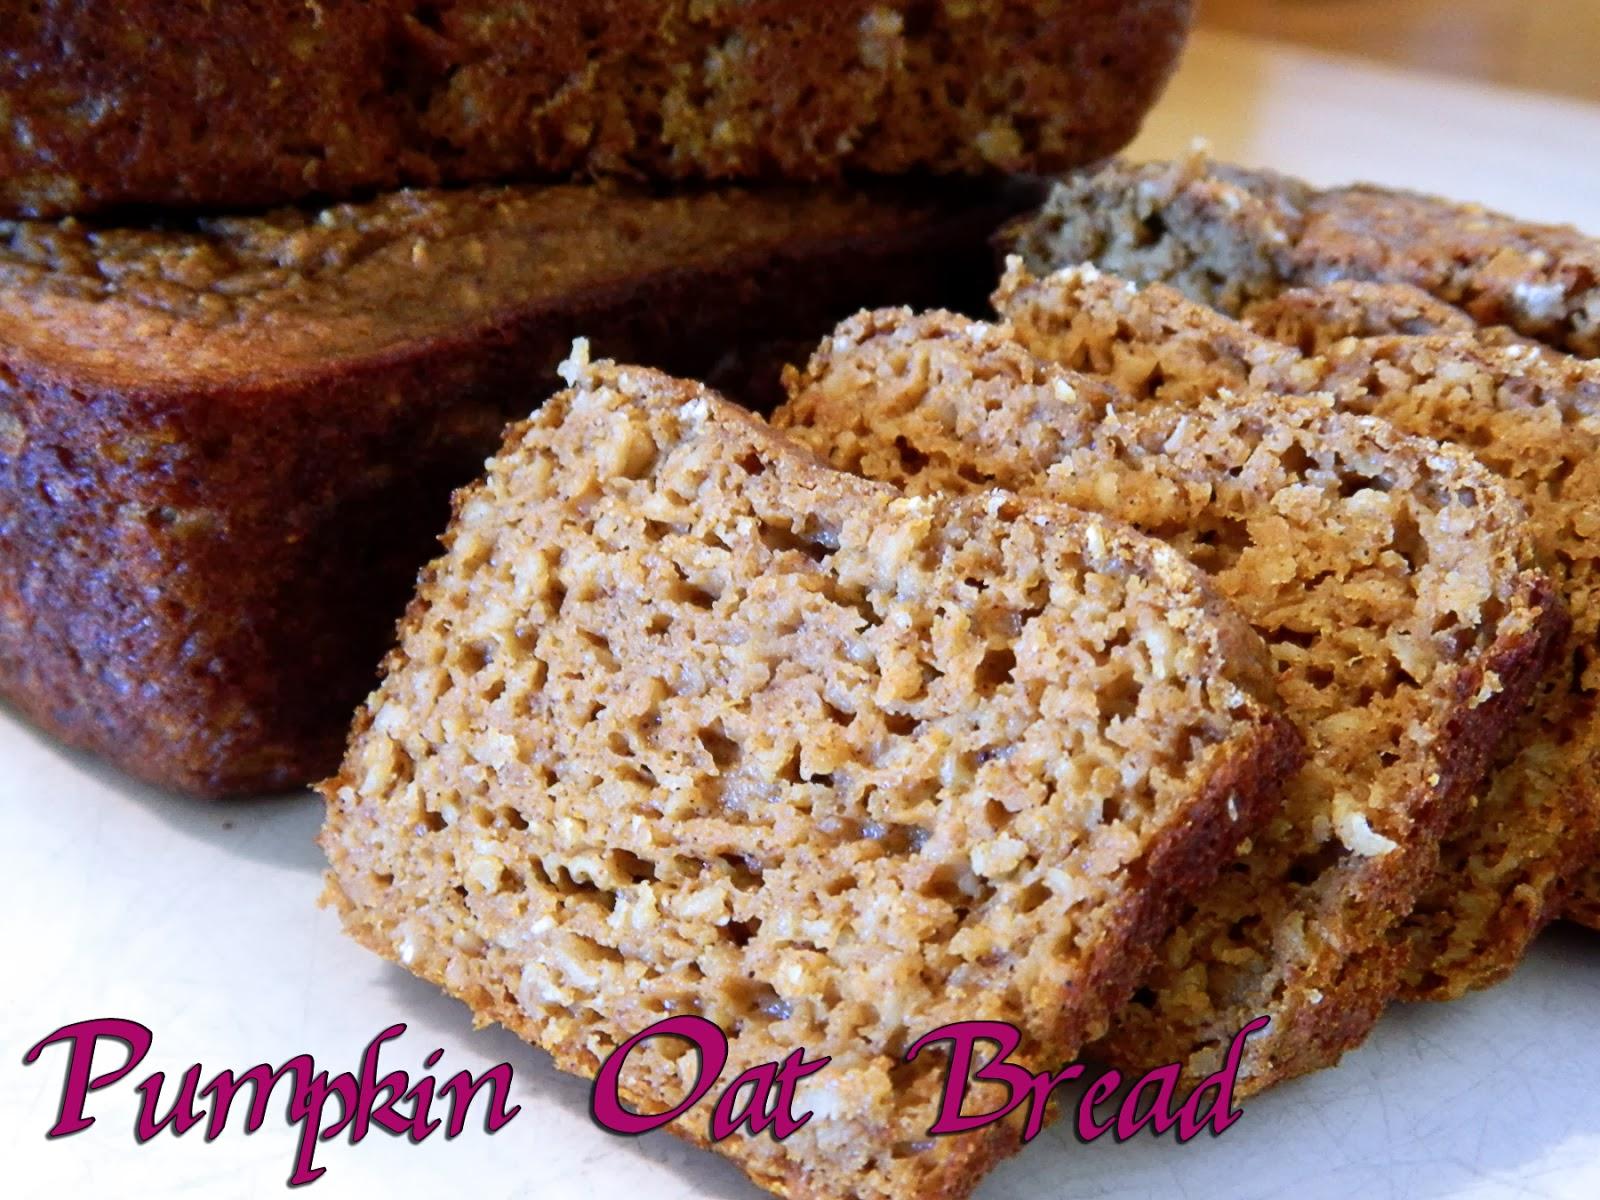 Eating Bariatric: Pumpkin Oat Bread